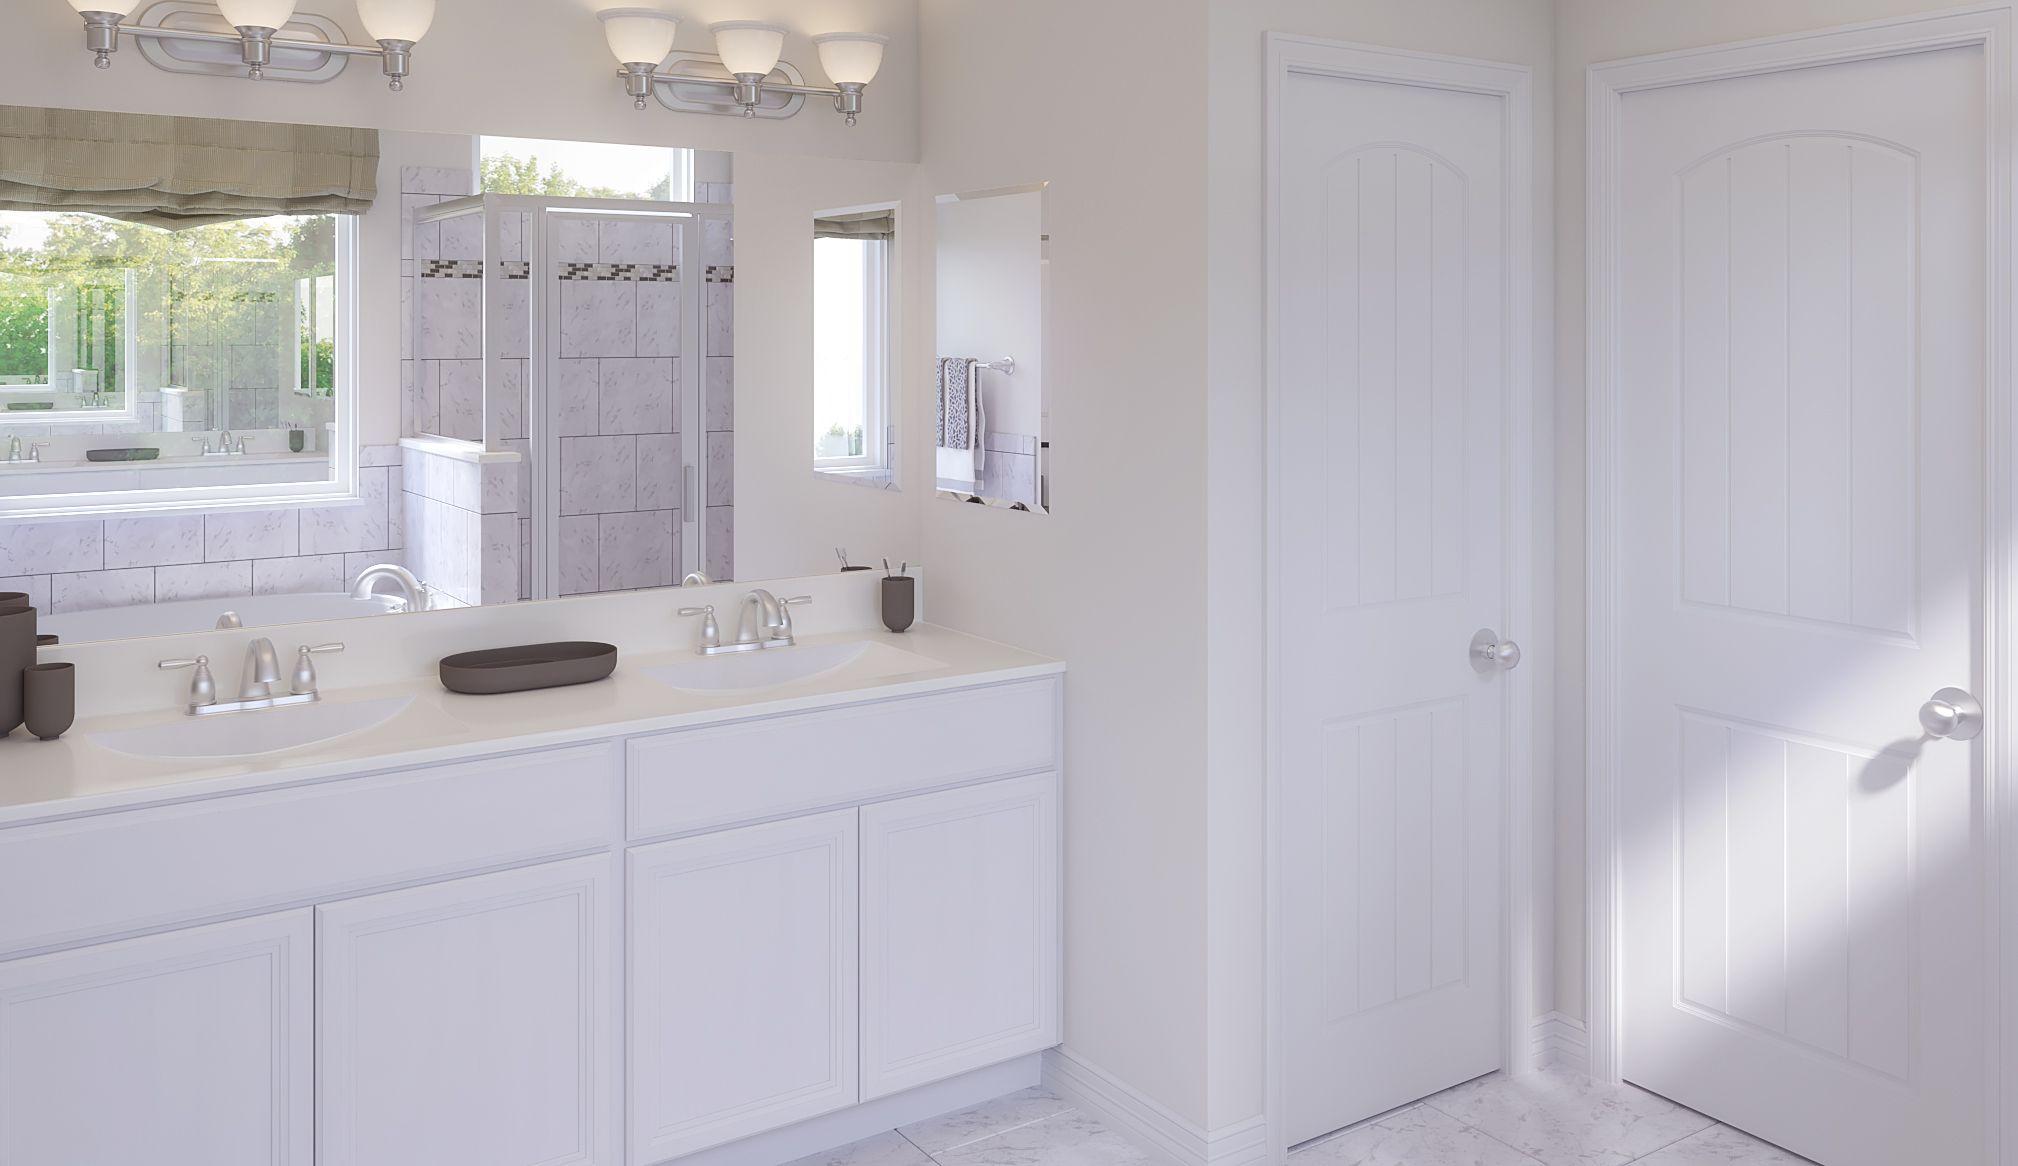 Bathroom featured in the Del Rio By Ashton Woods in San Antonio, TX